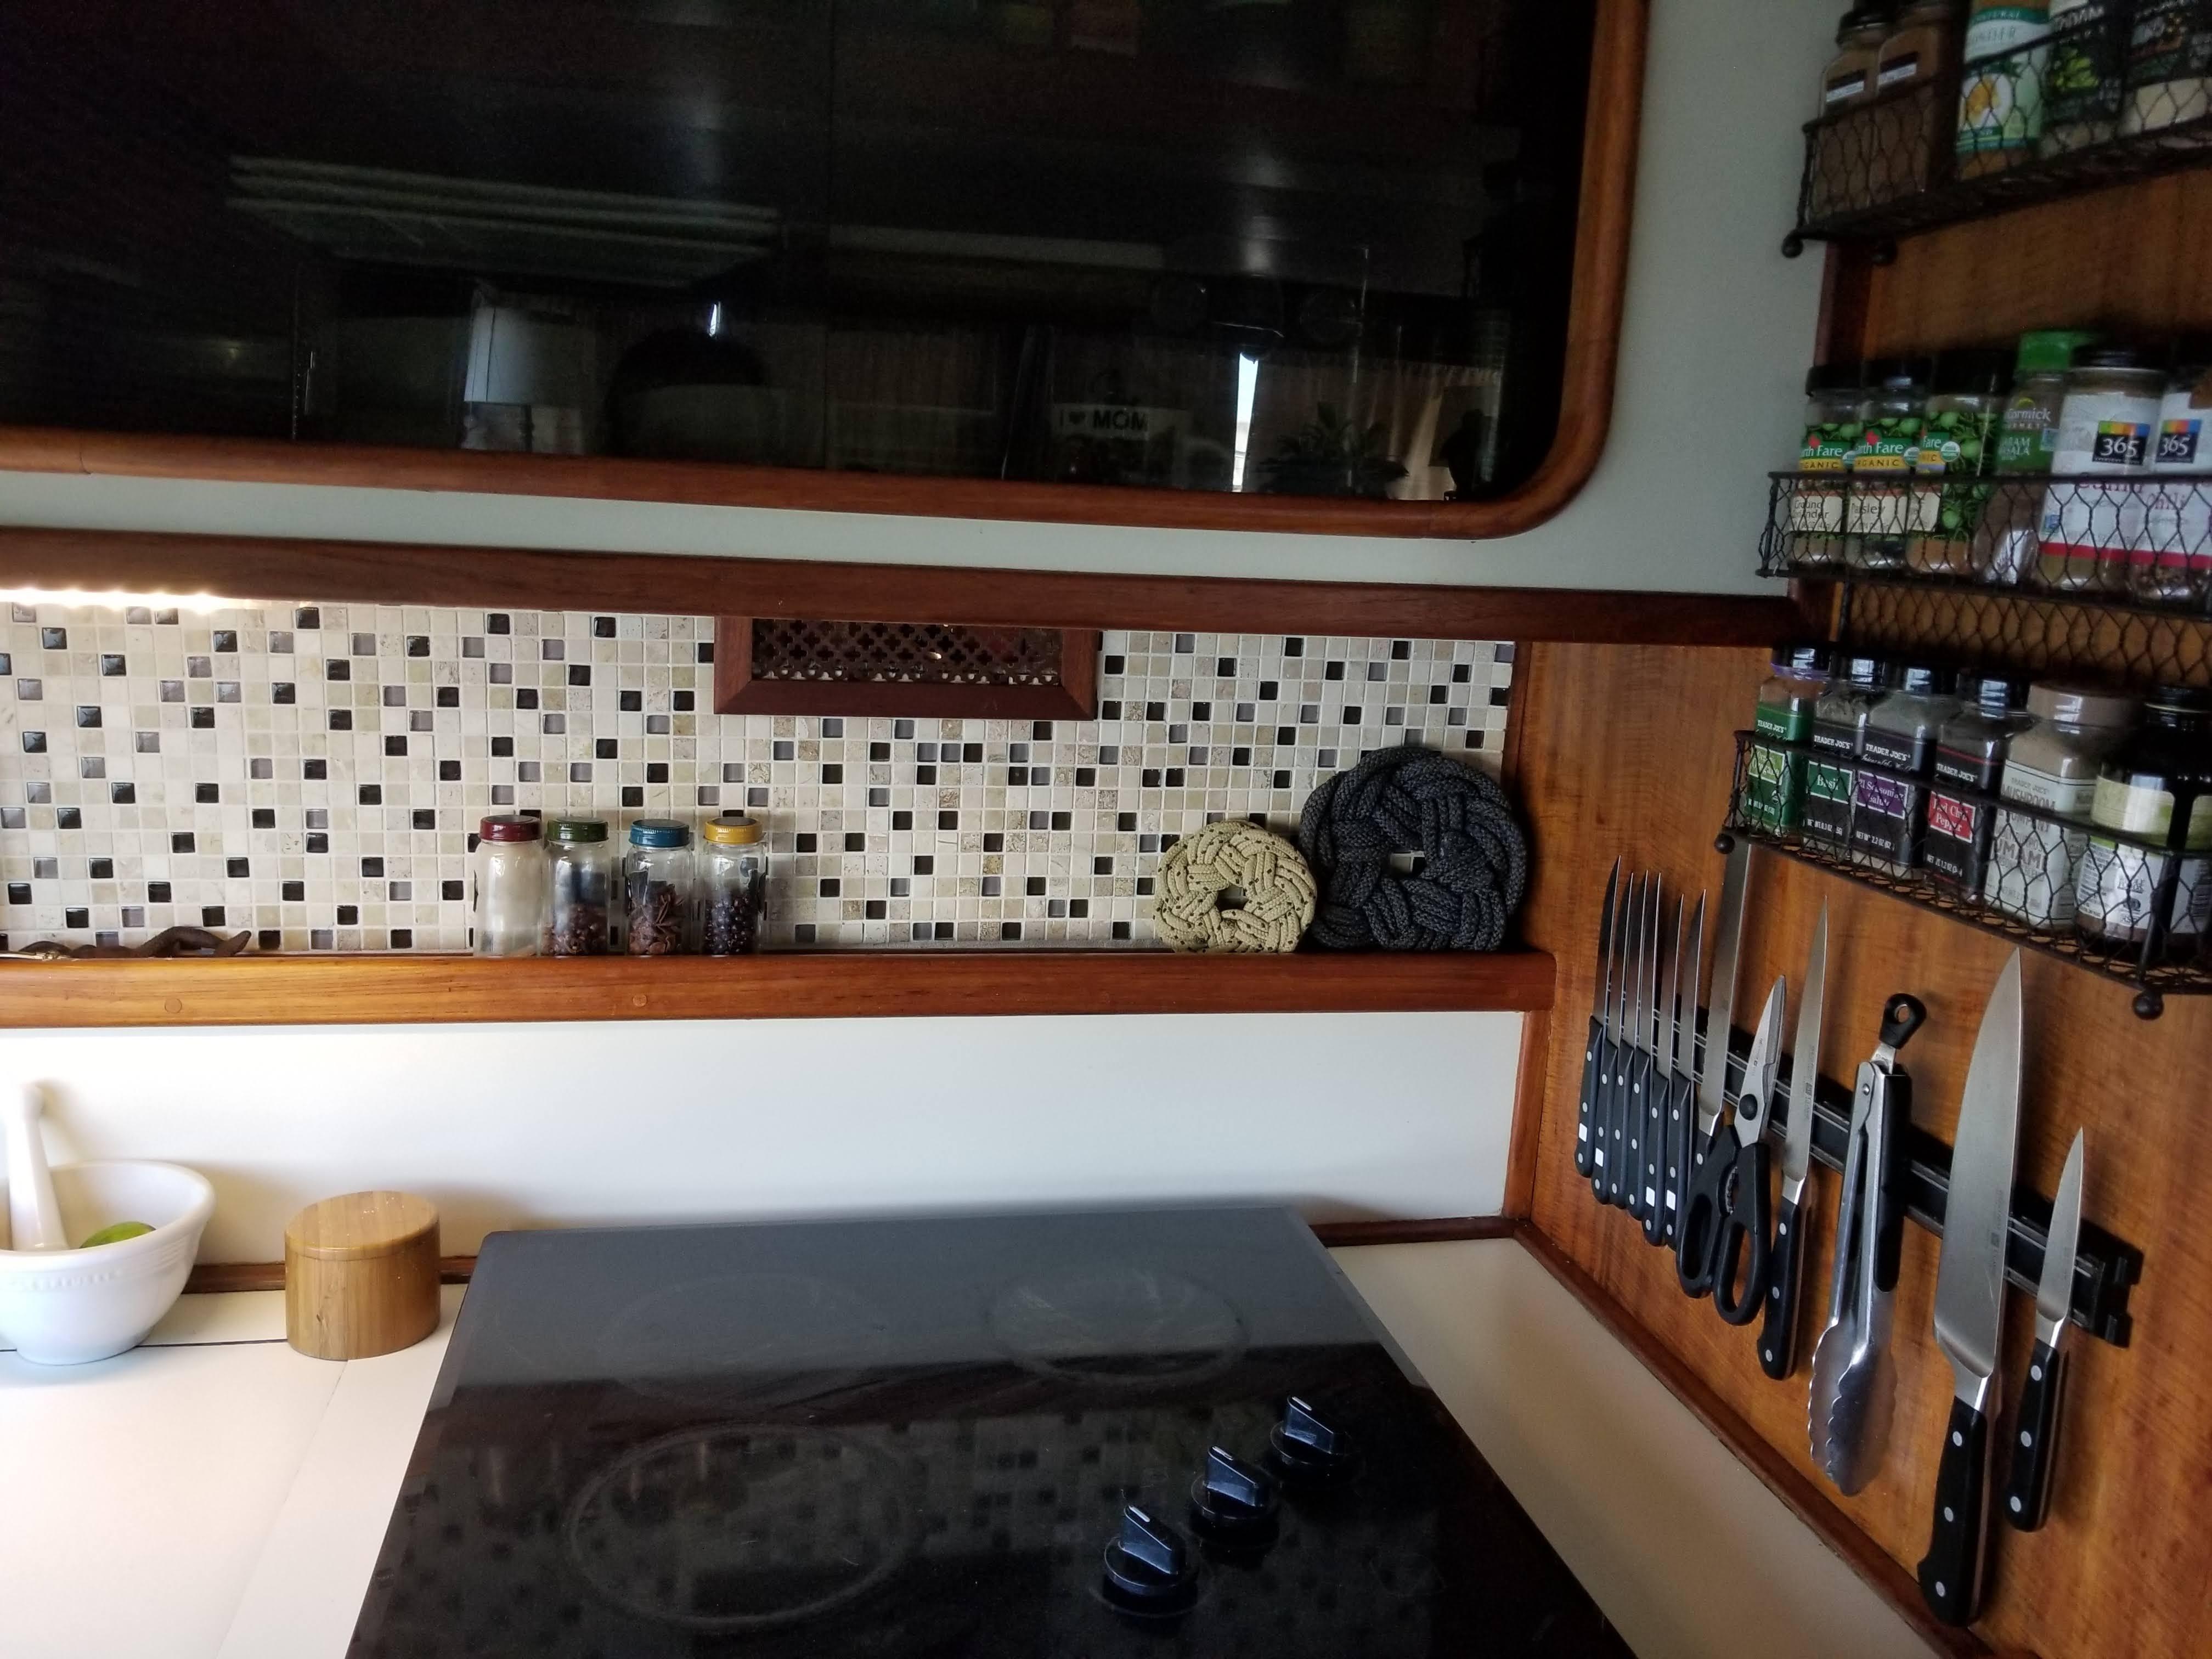 Prairie Boat Works 36 Dual Cabin - Electric stovetop/ceramic backsplash